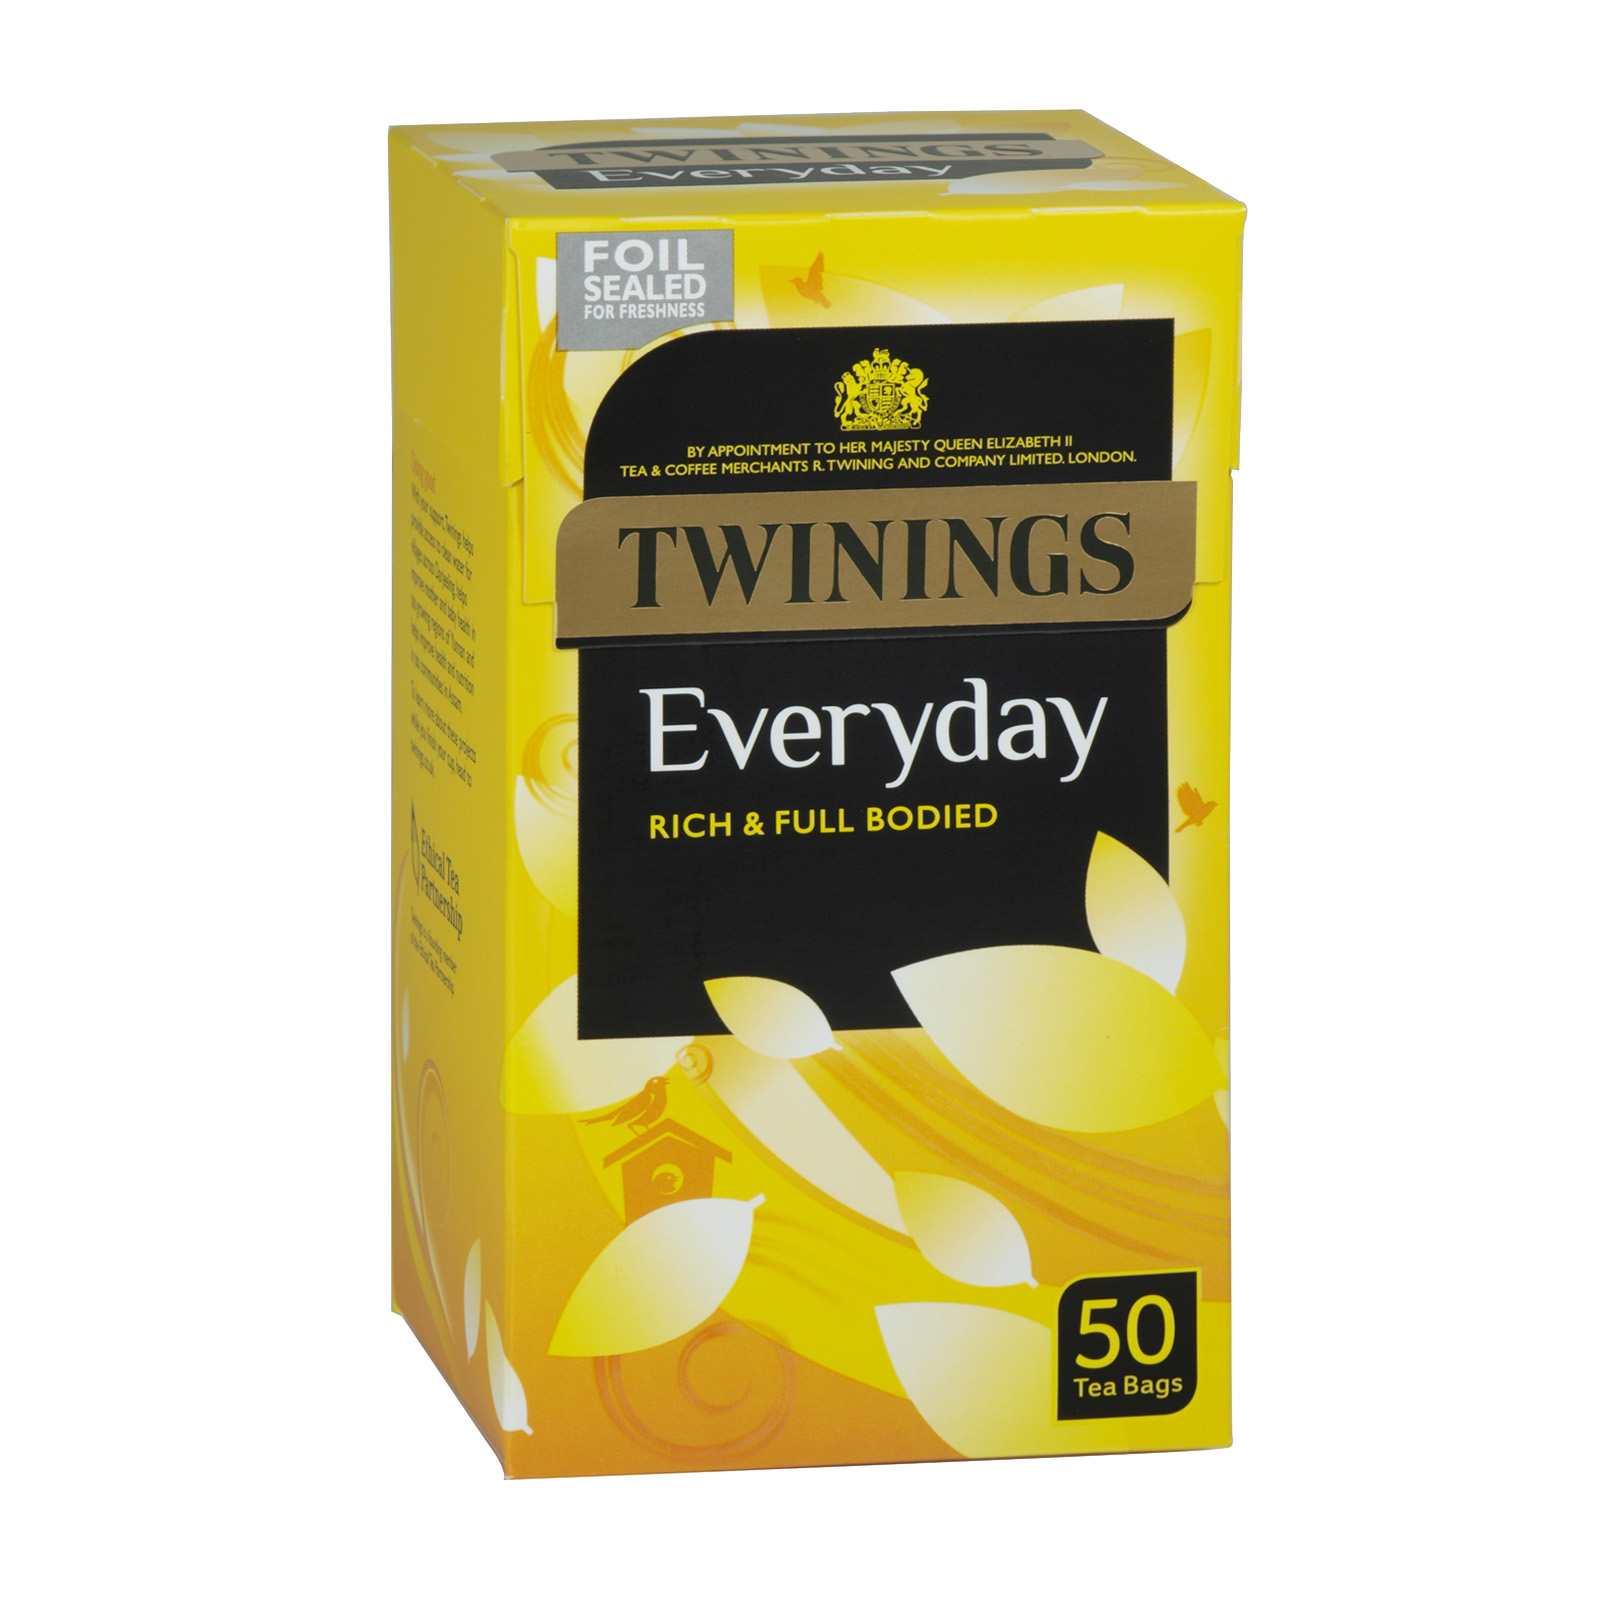 TWININGS EVERY DAY TEA BAGS 50S X4